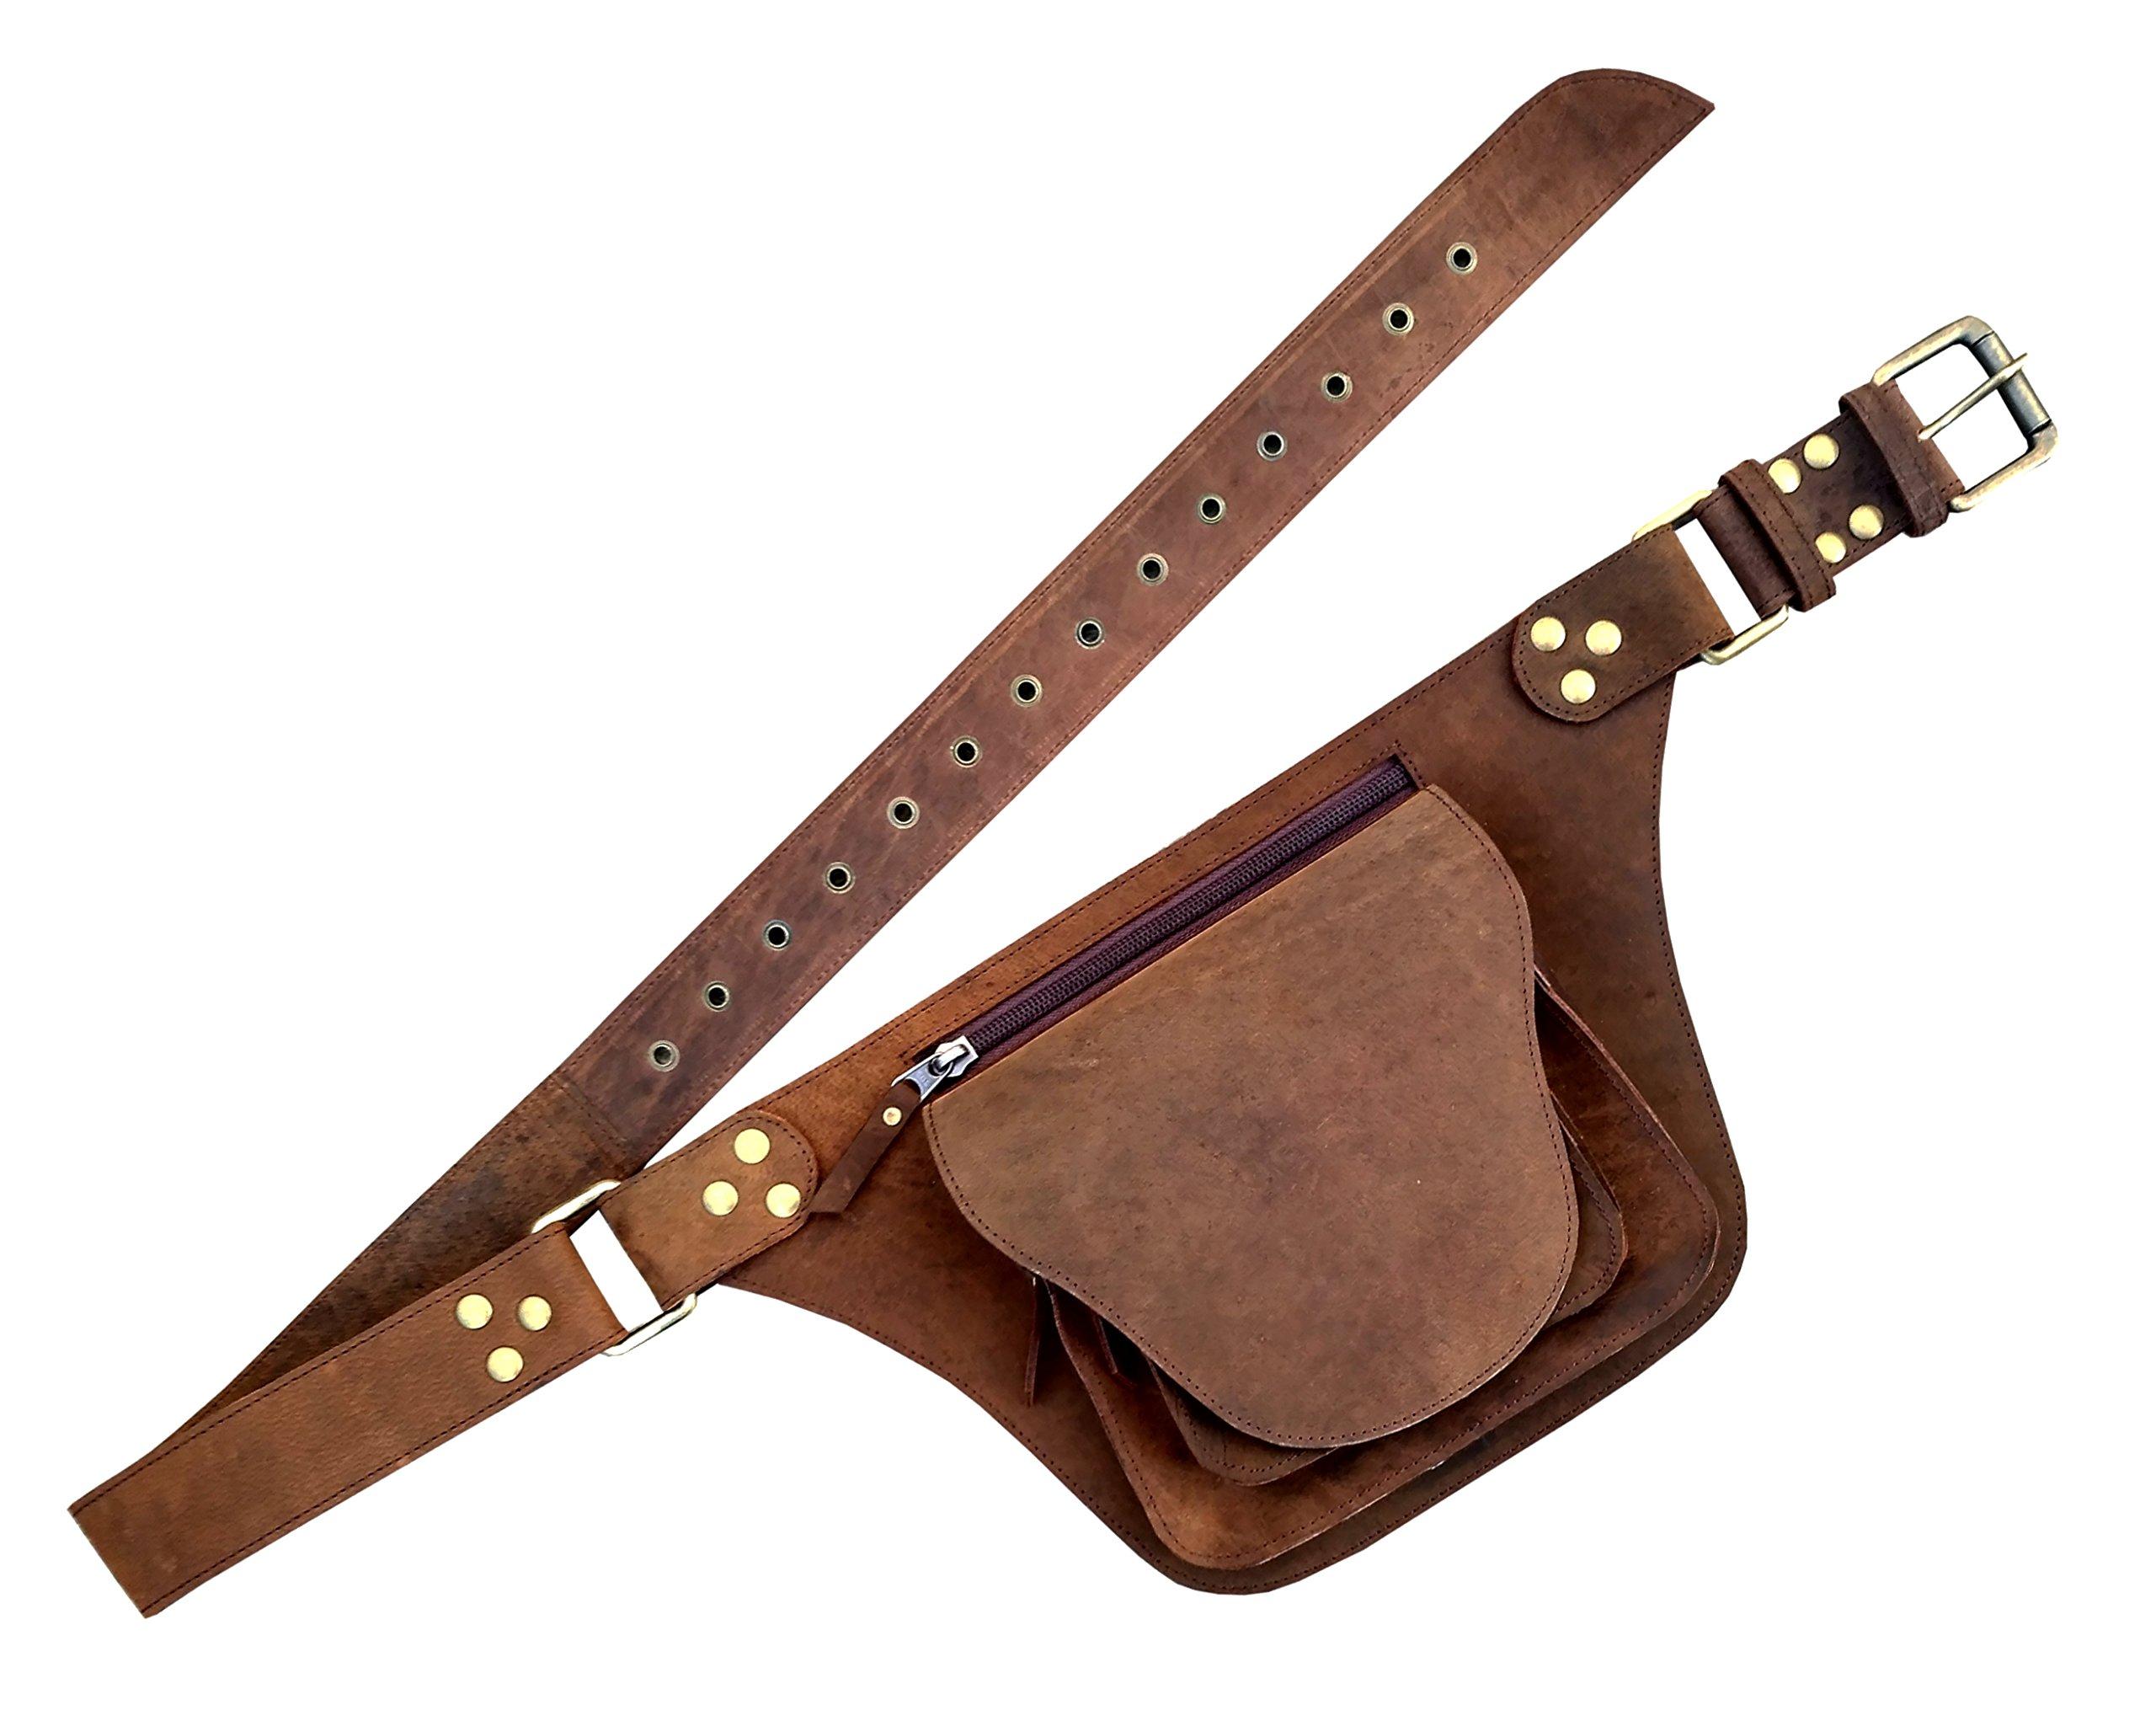 One Leaf Hunter Leather Utility Belt Rugged Brown Waist Pack